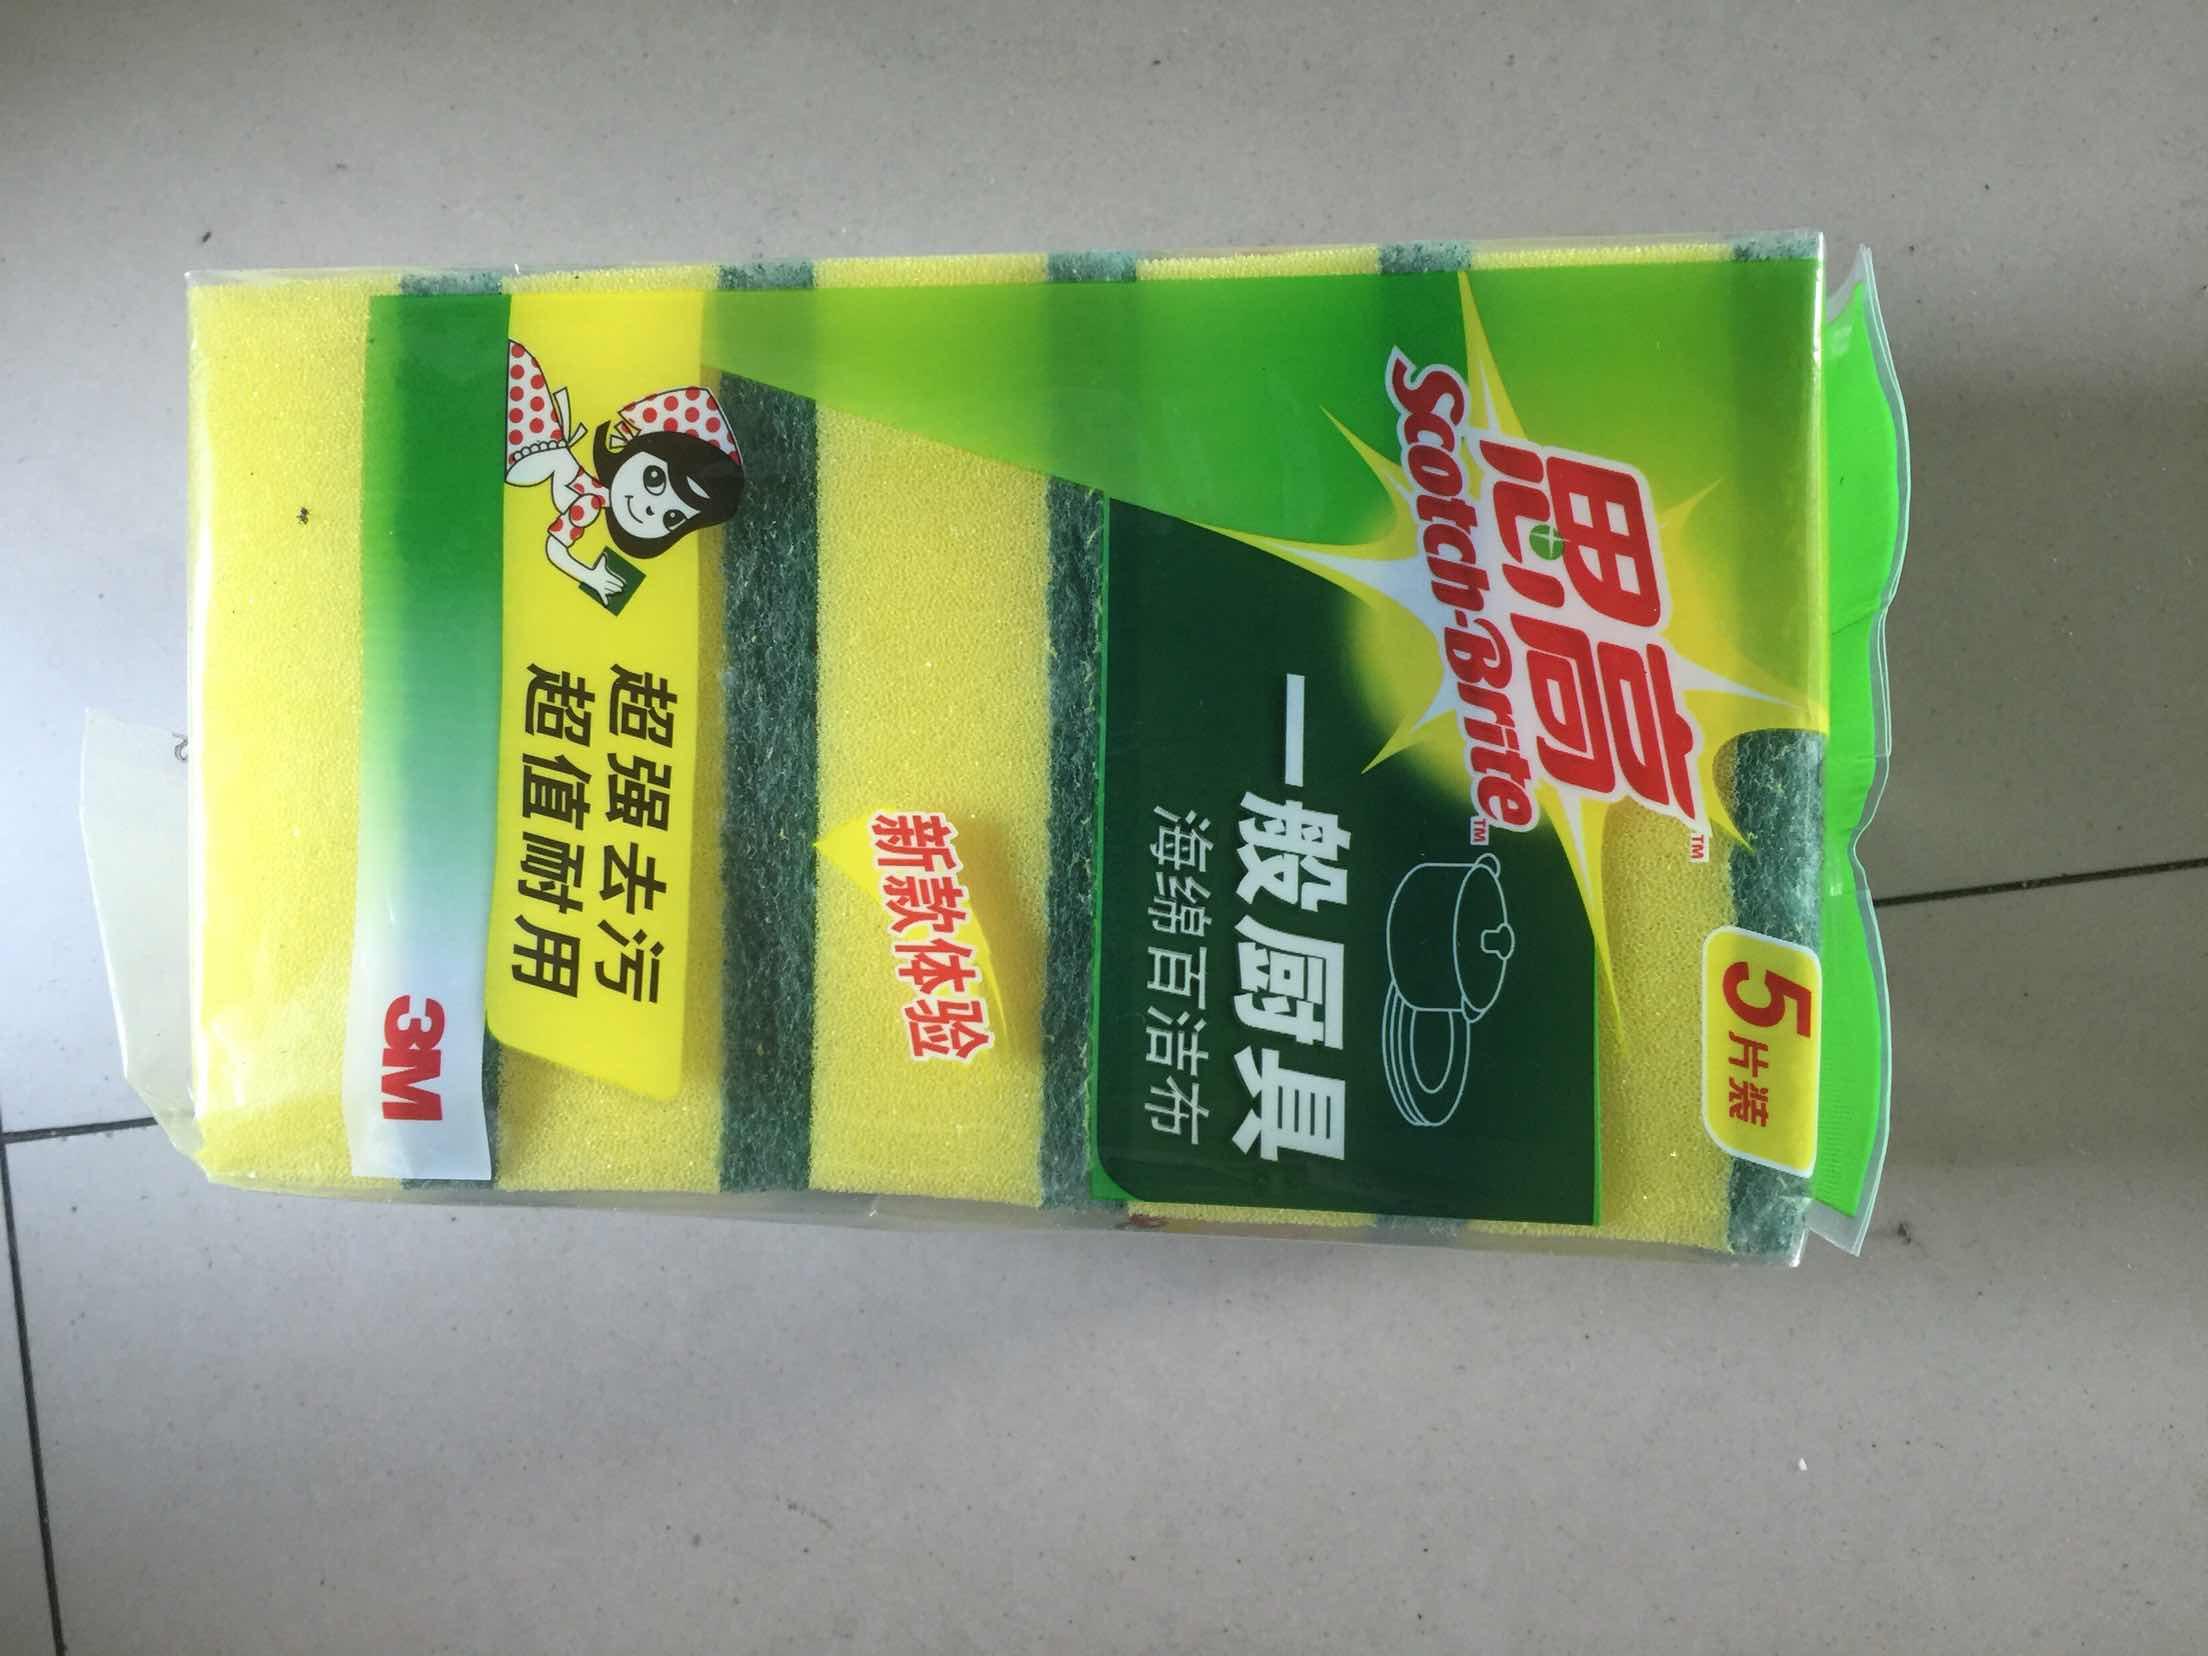 air speed turf max dan marino for sale 00155830 mall